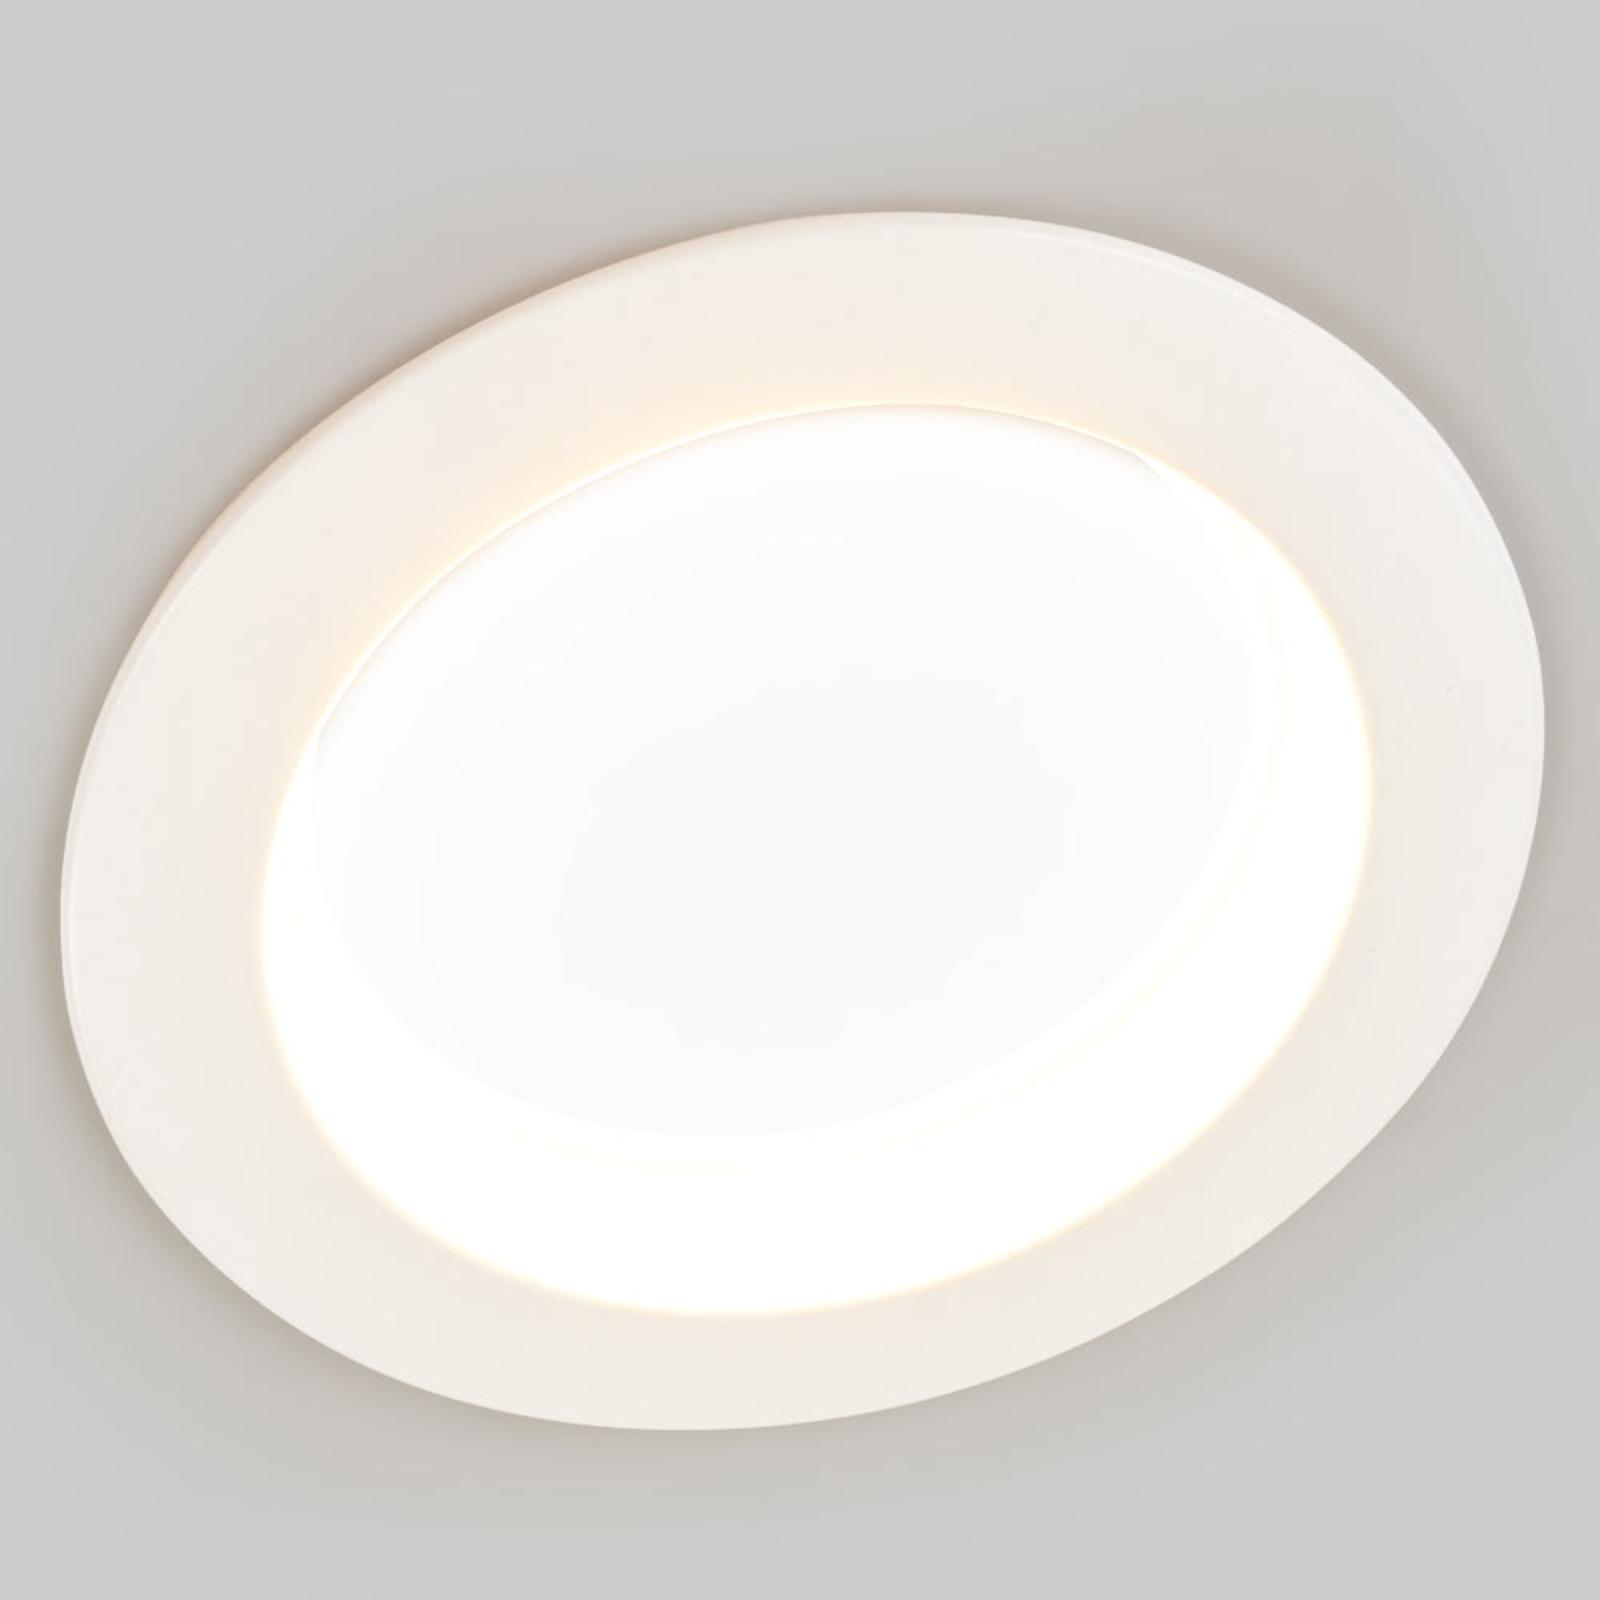 27 W LED recessed light Piet, 3,000K 4,000K 6,000K_9978036_1